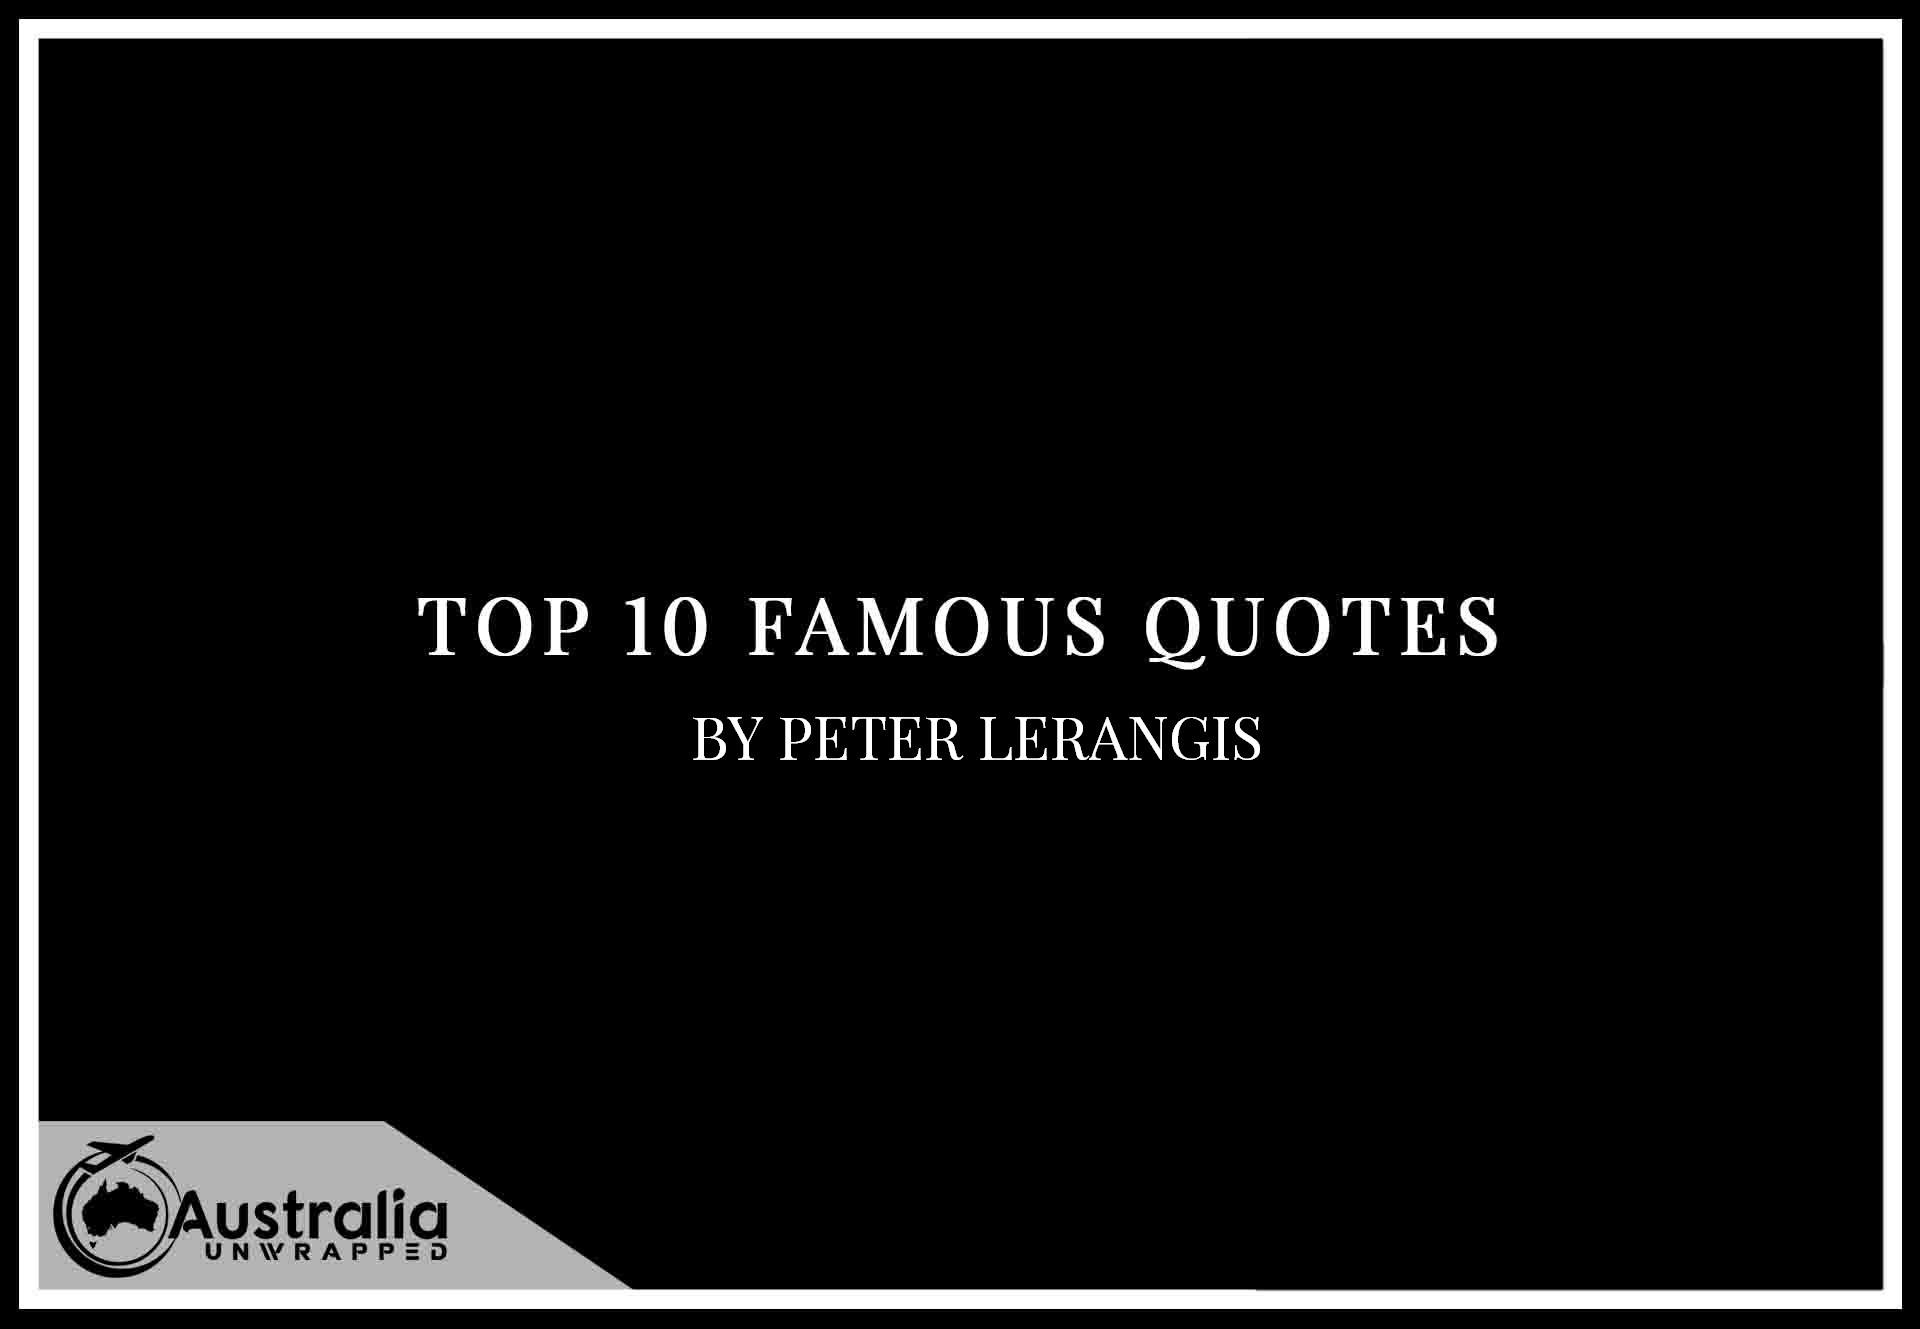 Top 10 Famous Quotes by Author Peter Lerangis